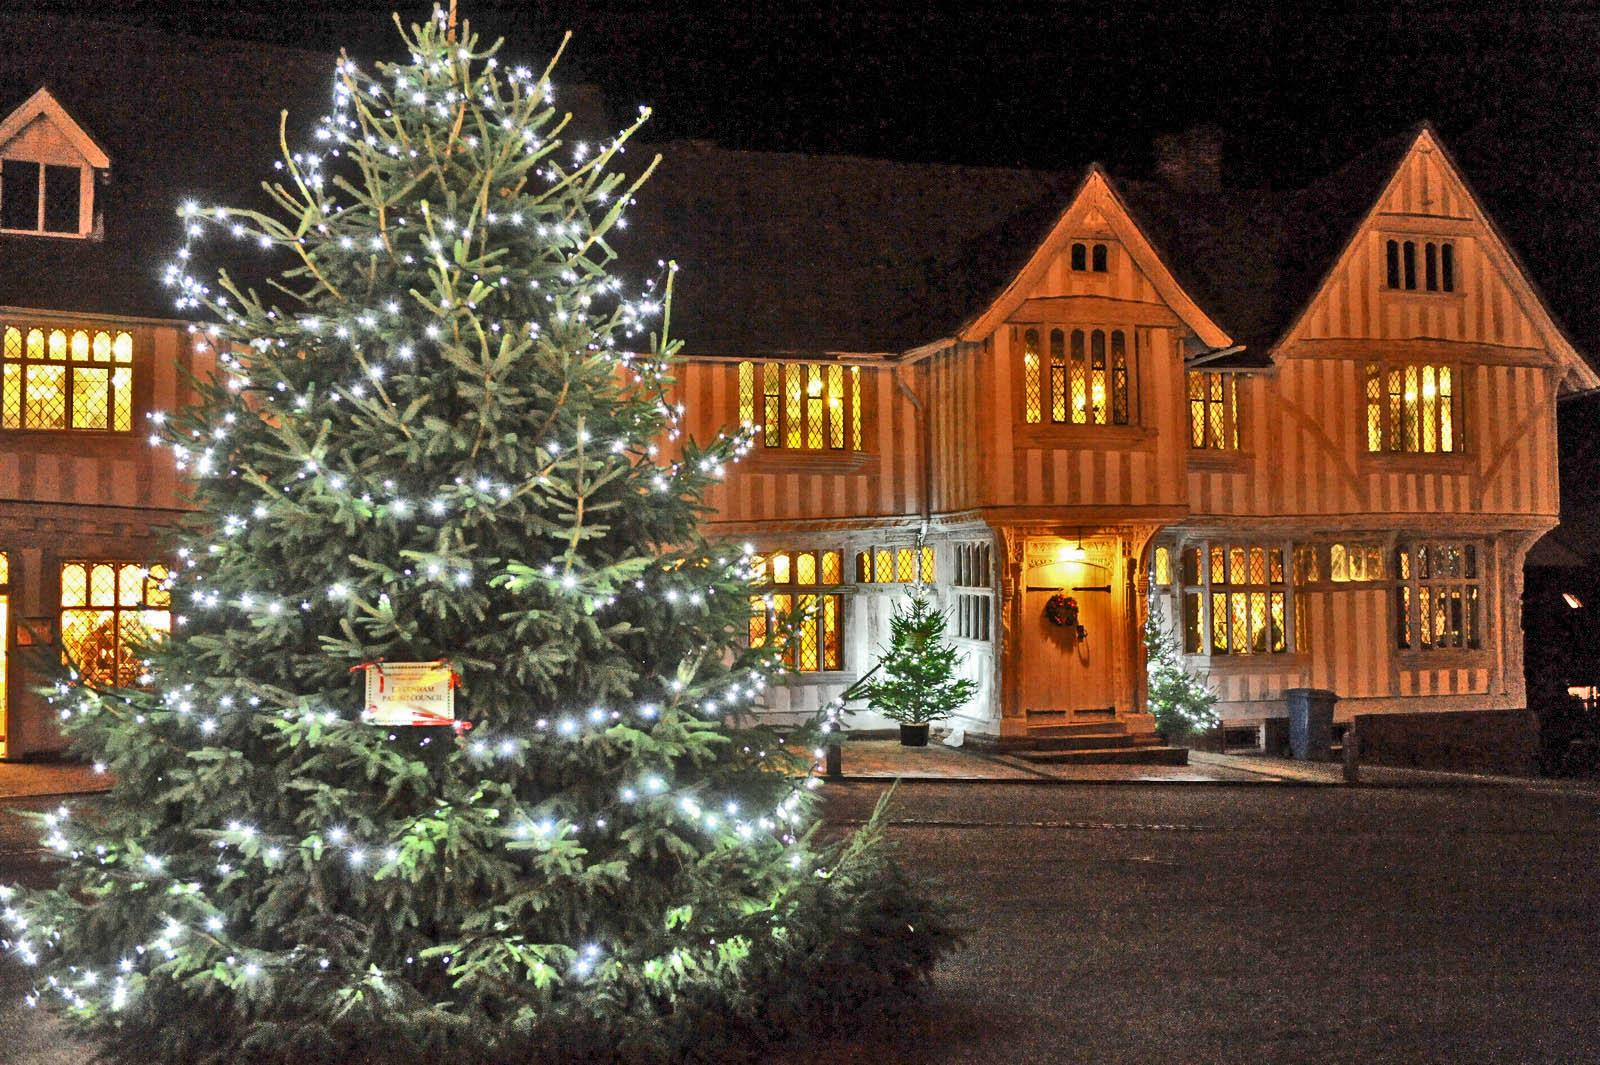 Lavenham Christmas Fair - December 7-9